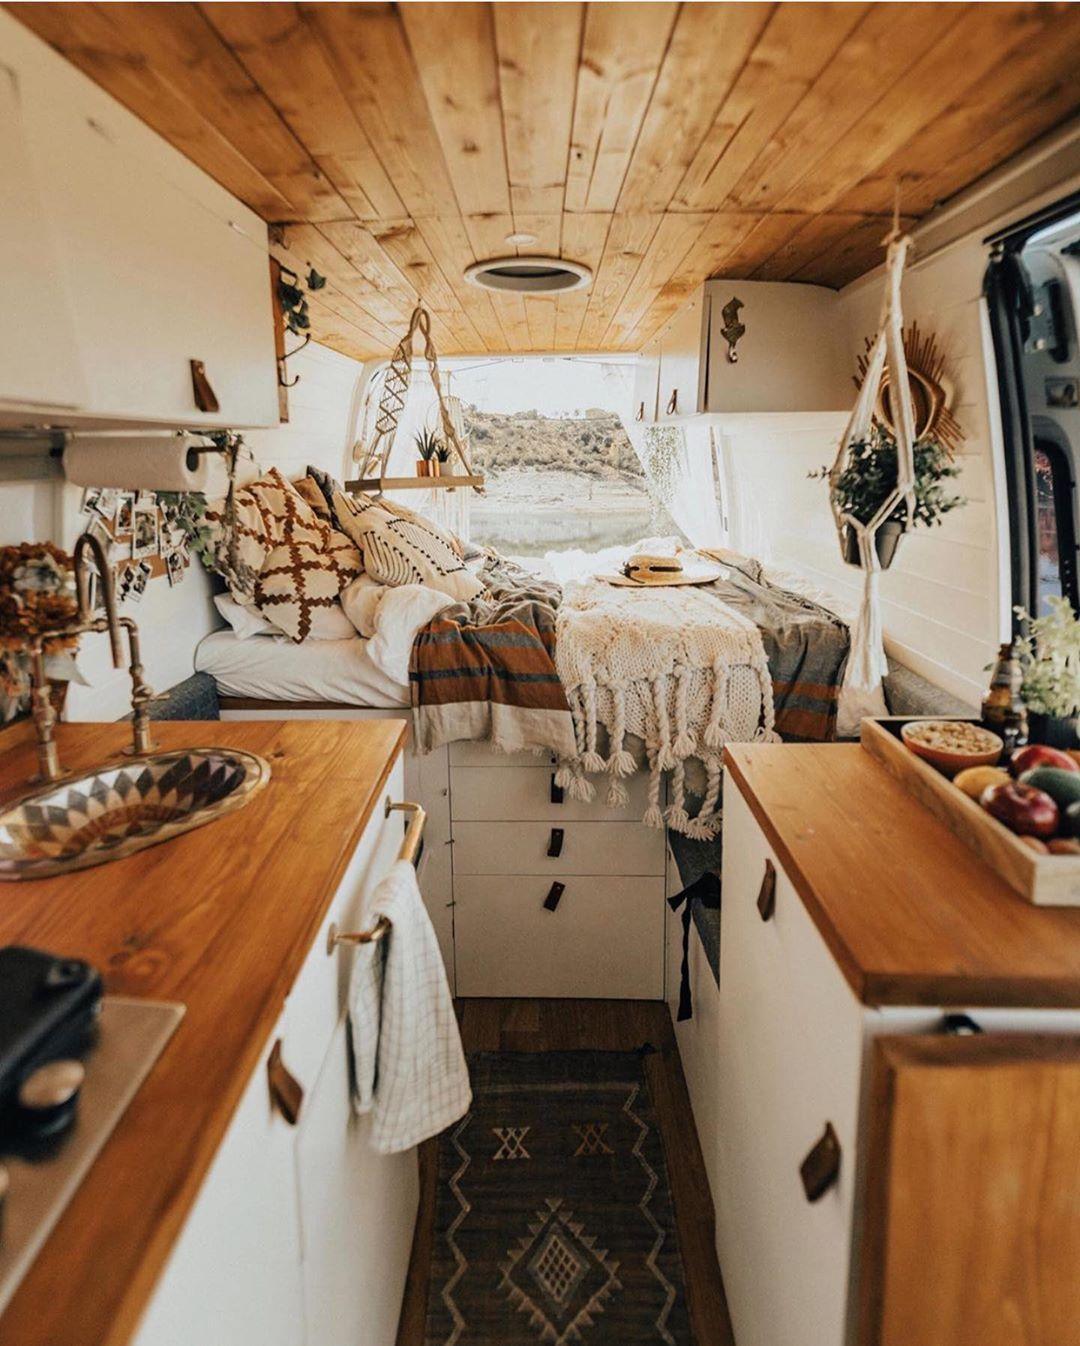 Photo of 59 Amazing Caravan Interior Design Ideas- 2020 Page 21 of 59 colouredbikinis. com #Amazing #caravan